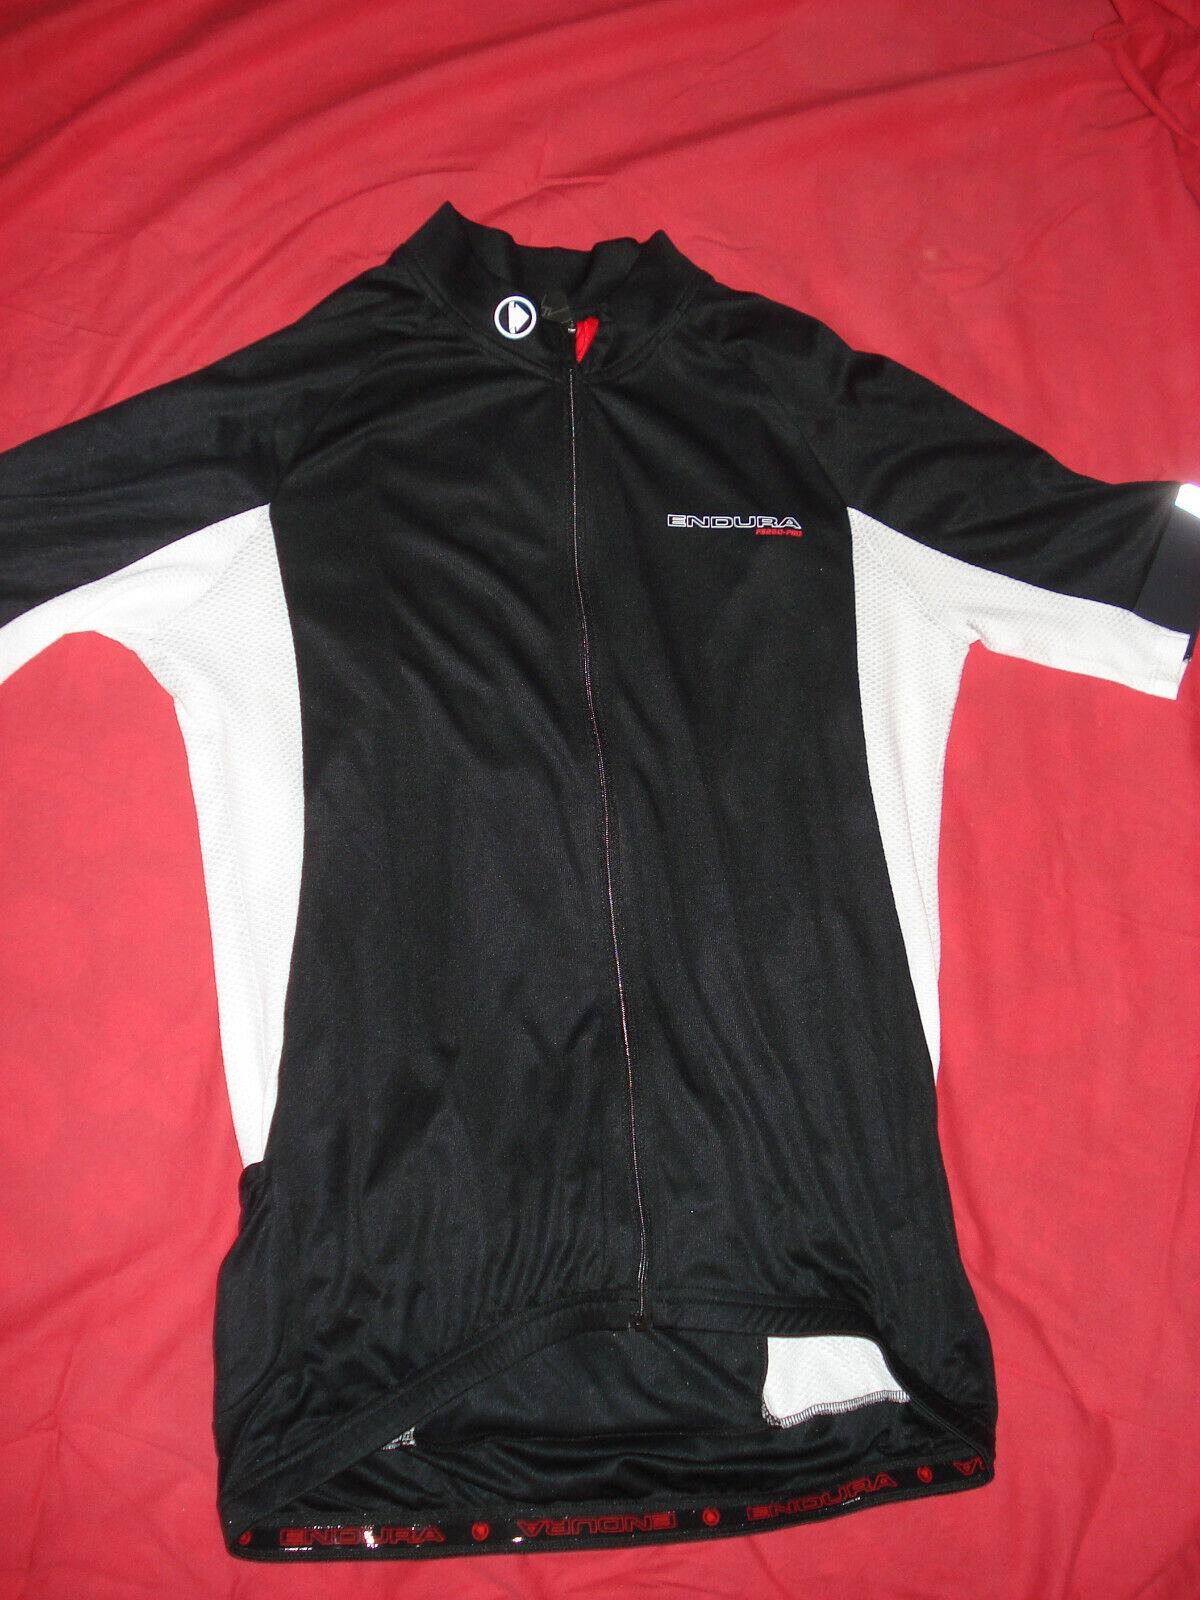 Endura FS260 Pro III Maglia Jersey Bici Bicicletta MTB Bianco schwarz XL Nuova